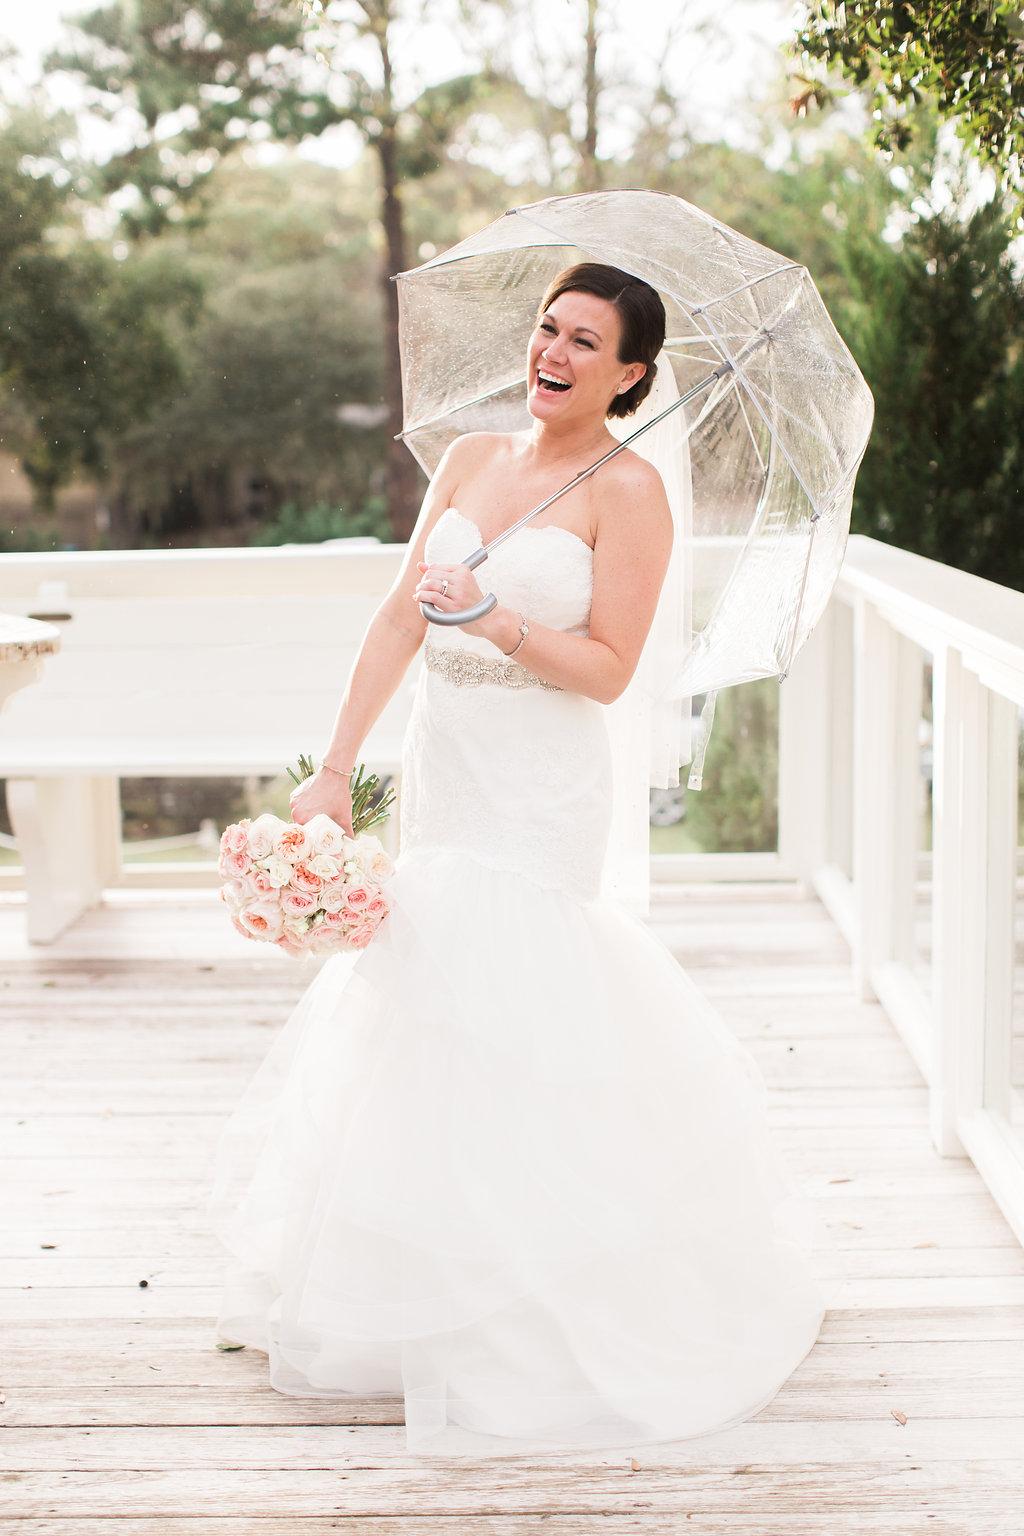 apt-b-photography-ivory-and-beau-bridal-boutique-savannah-florist-savannah-wedding-flowers-savannah-wedding-planner-tybee-island-wedding-chapel-wedding-rose-bouquet-blush-wedding-tybee-wedding-savannah-weddings-savannah-flowers-15.jpg